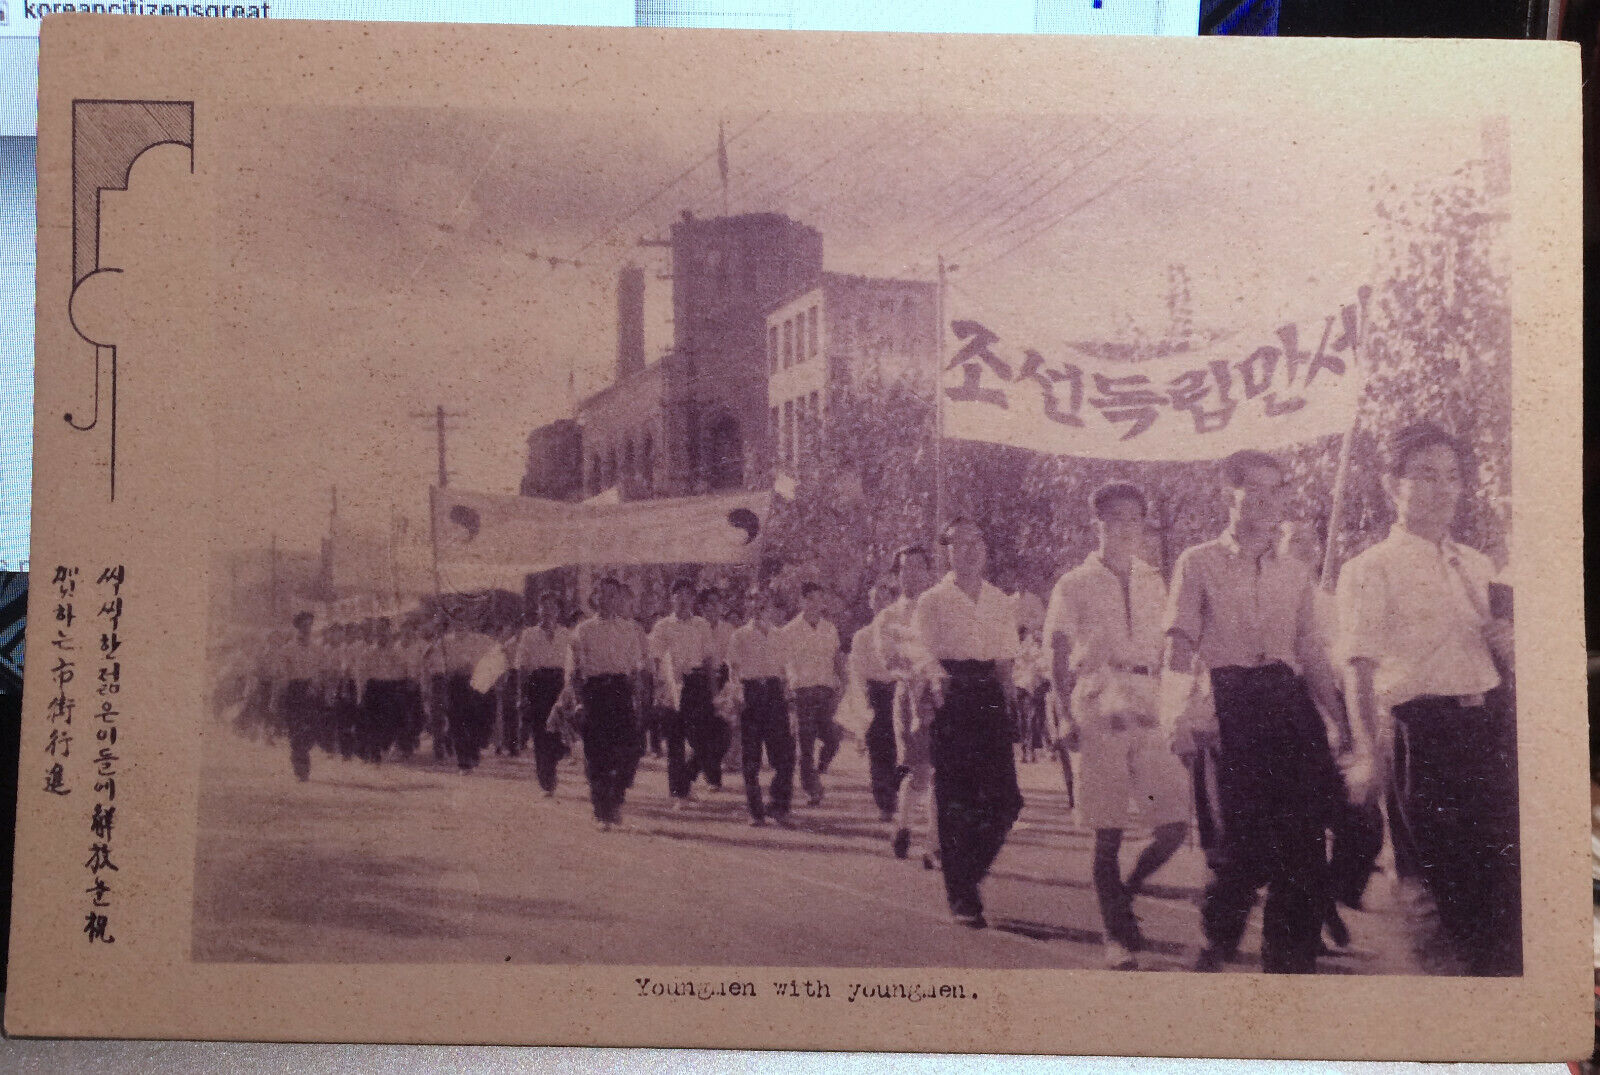 KOREAN LIBERATION INDEPENDENCE Post Card, YOUNG MEN PARADE Street Scene  - $28.00